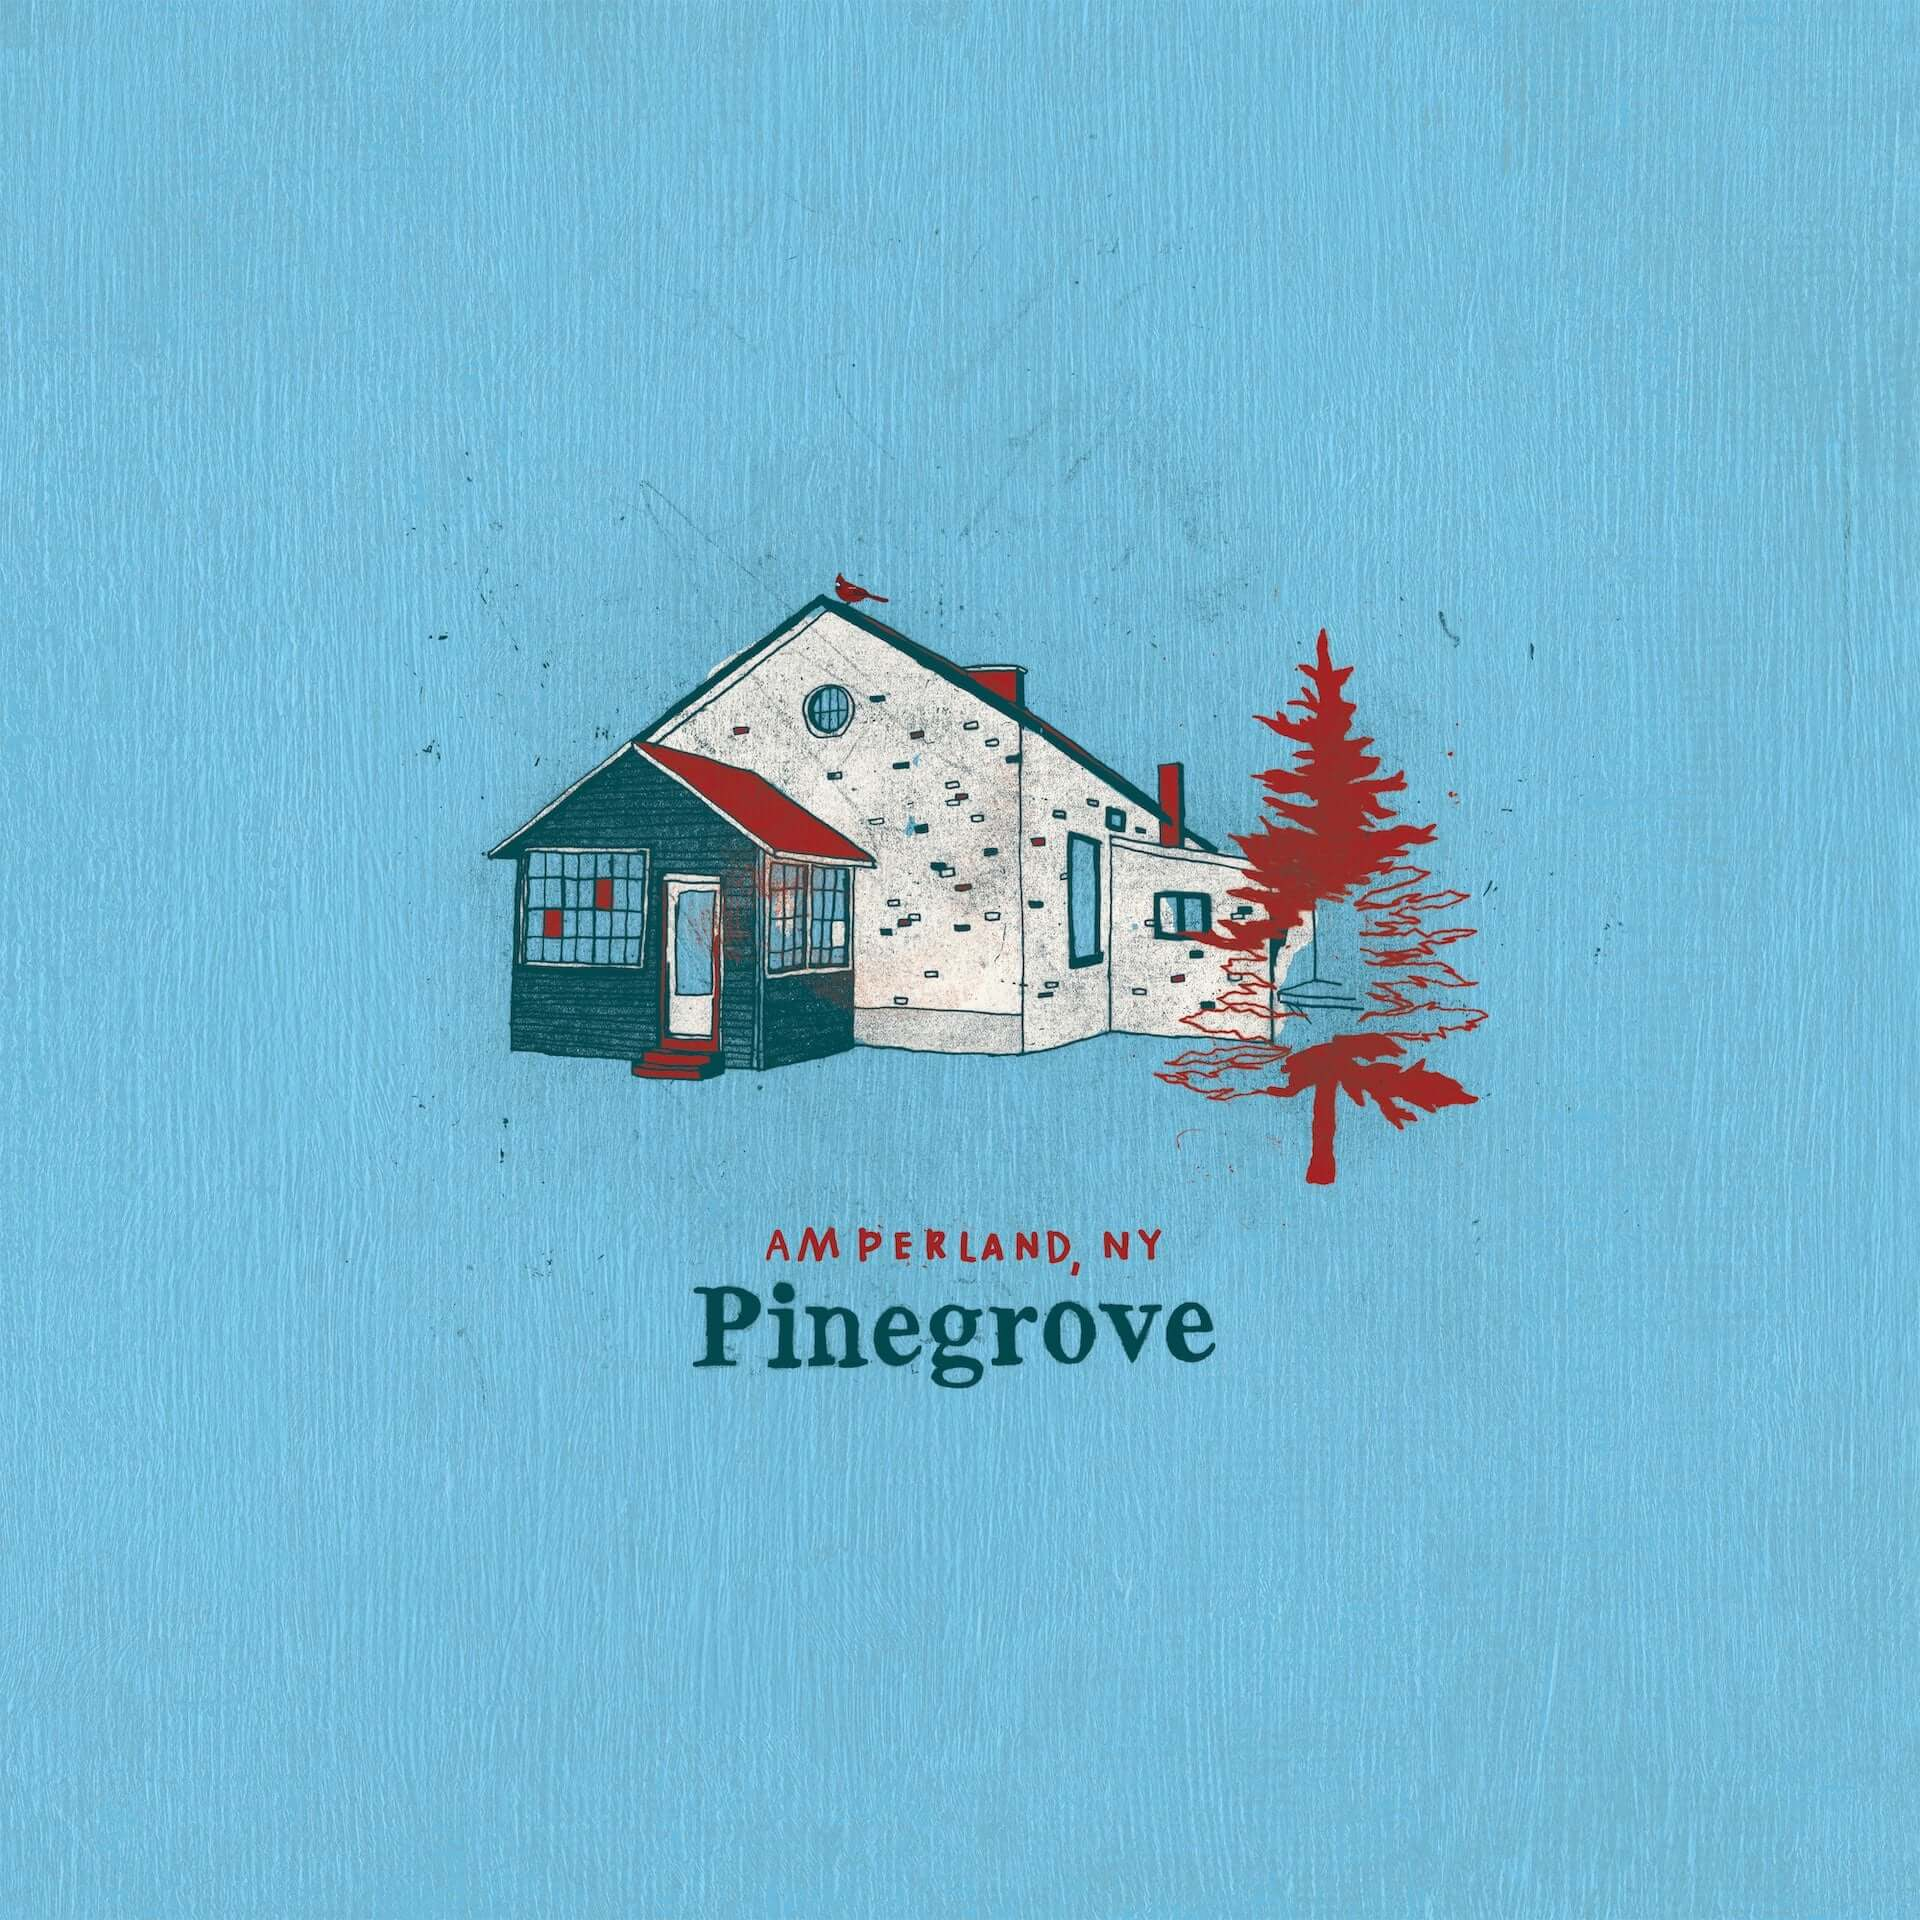 Pinegrove初のスタジオ・ライブ・ベスト盤『Amperland, NY』が発売決定!Half Waifとして知られるNandi Roseもフィーチャー music201204_pinegrove_2-1920x1920